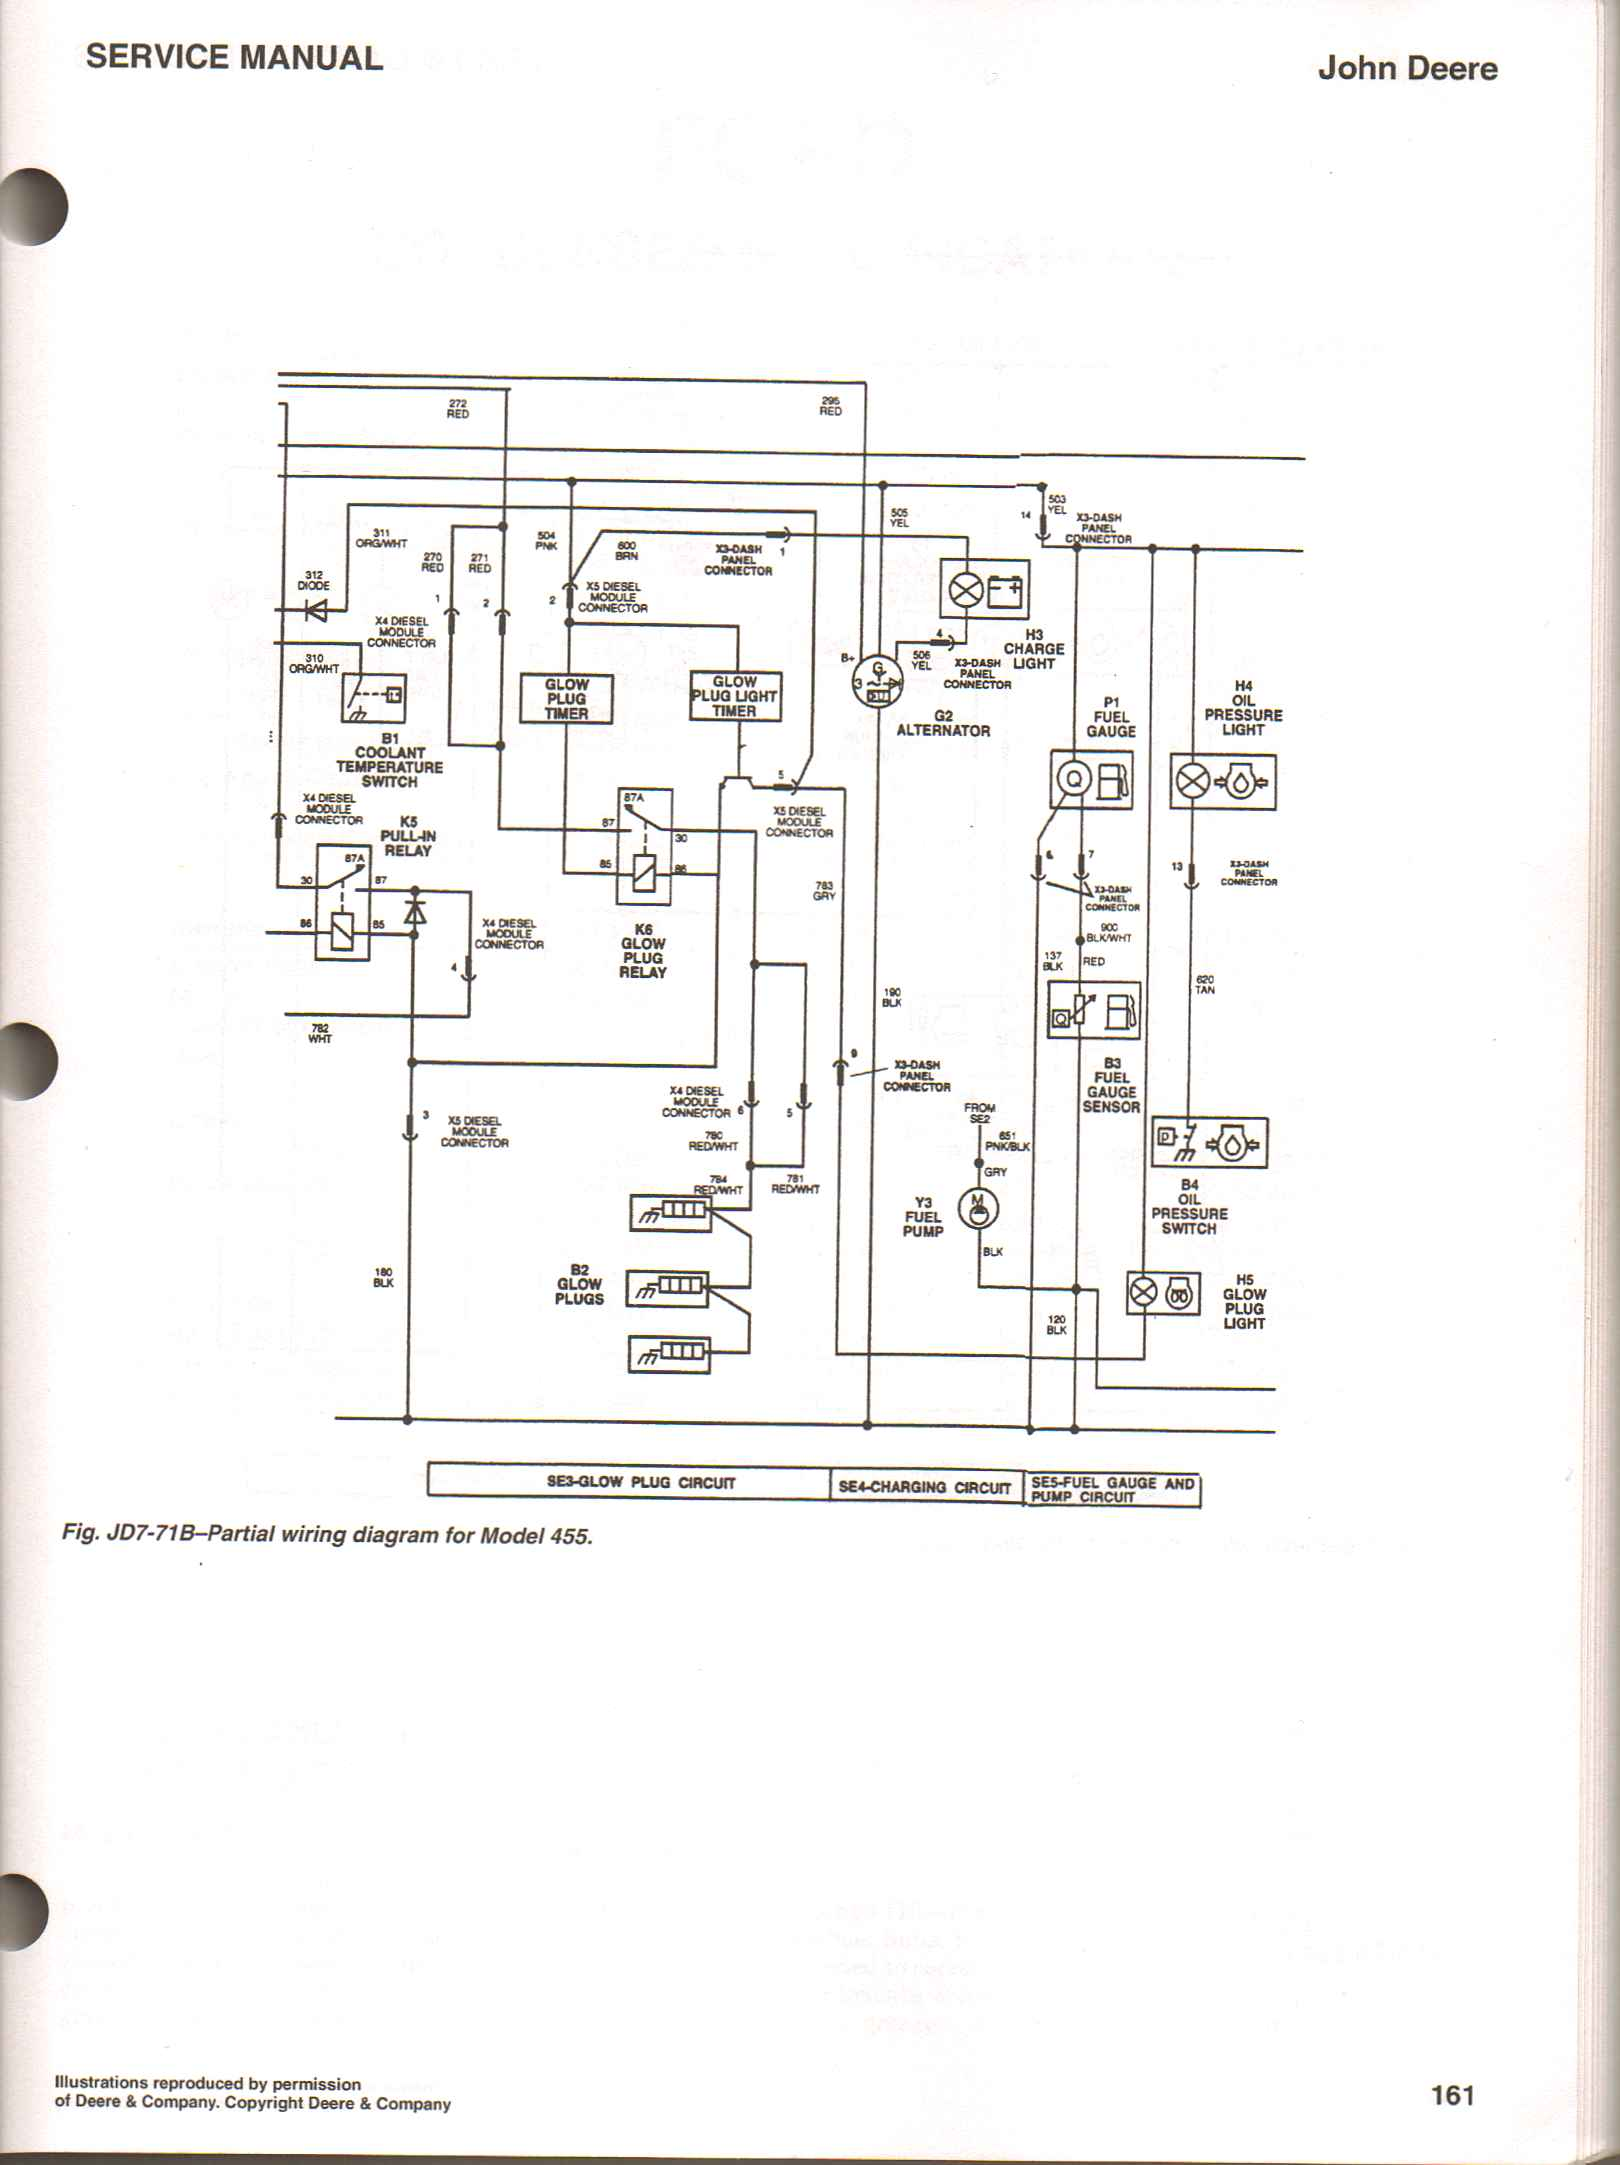 YY_7508] Wiring Diagram For John Deere 425 Wiring DiagramStap Hylec Scata Scoba Mohammedshrine Librar Wiring 101